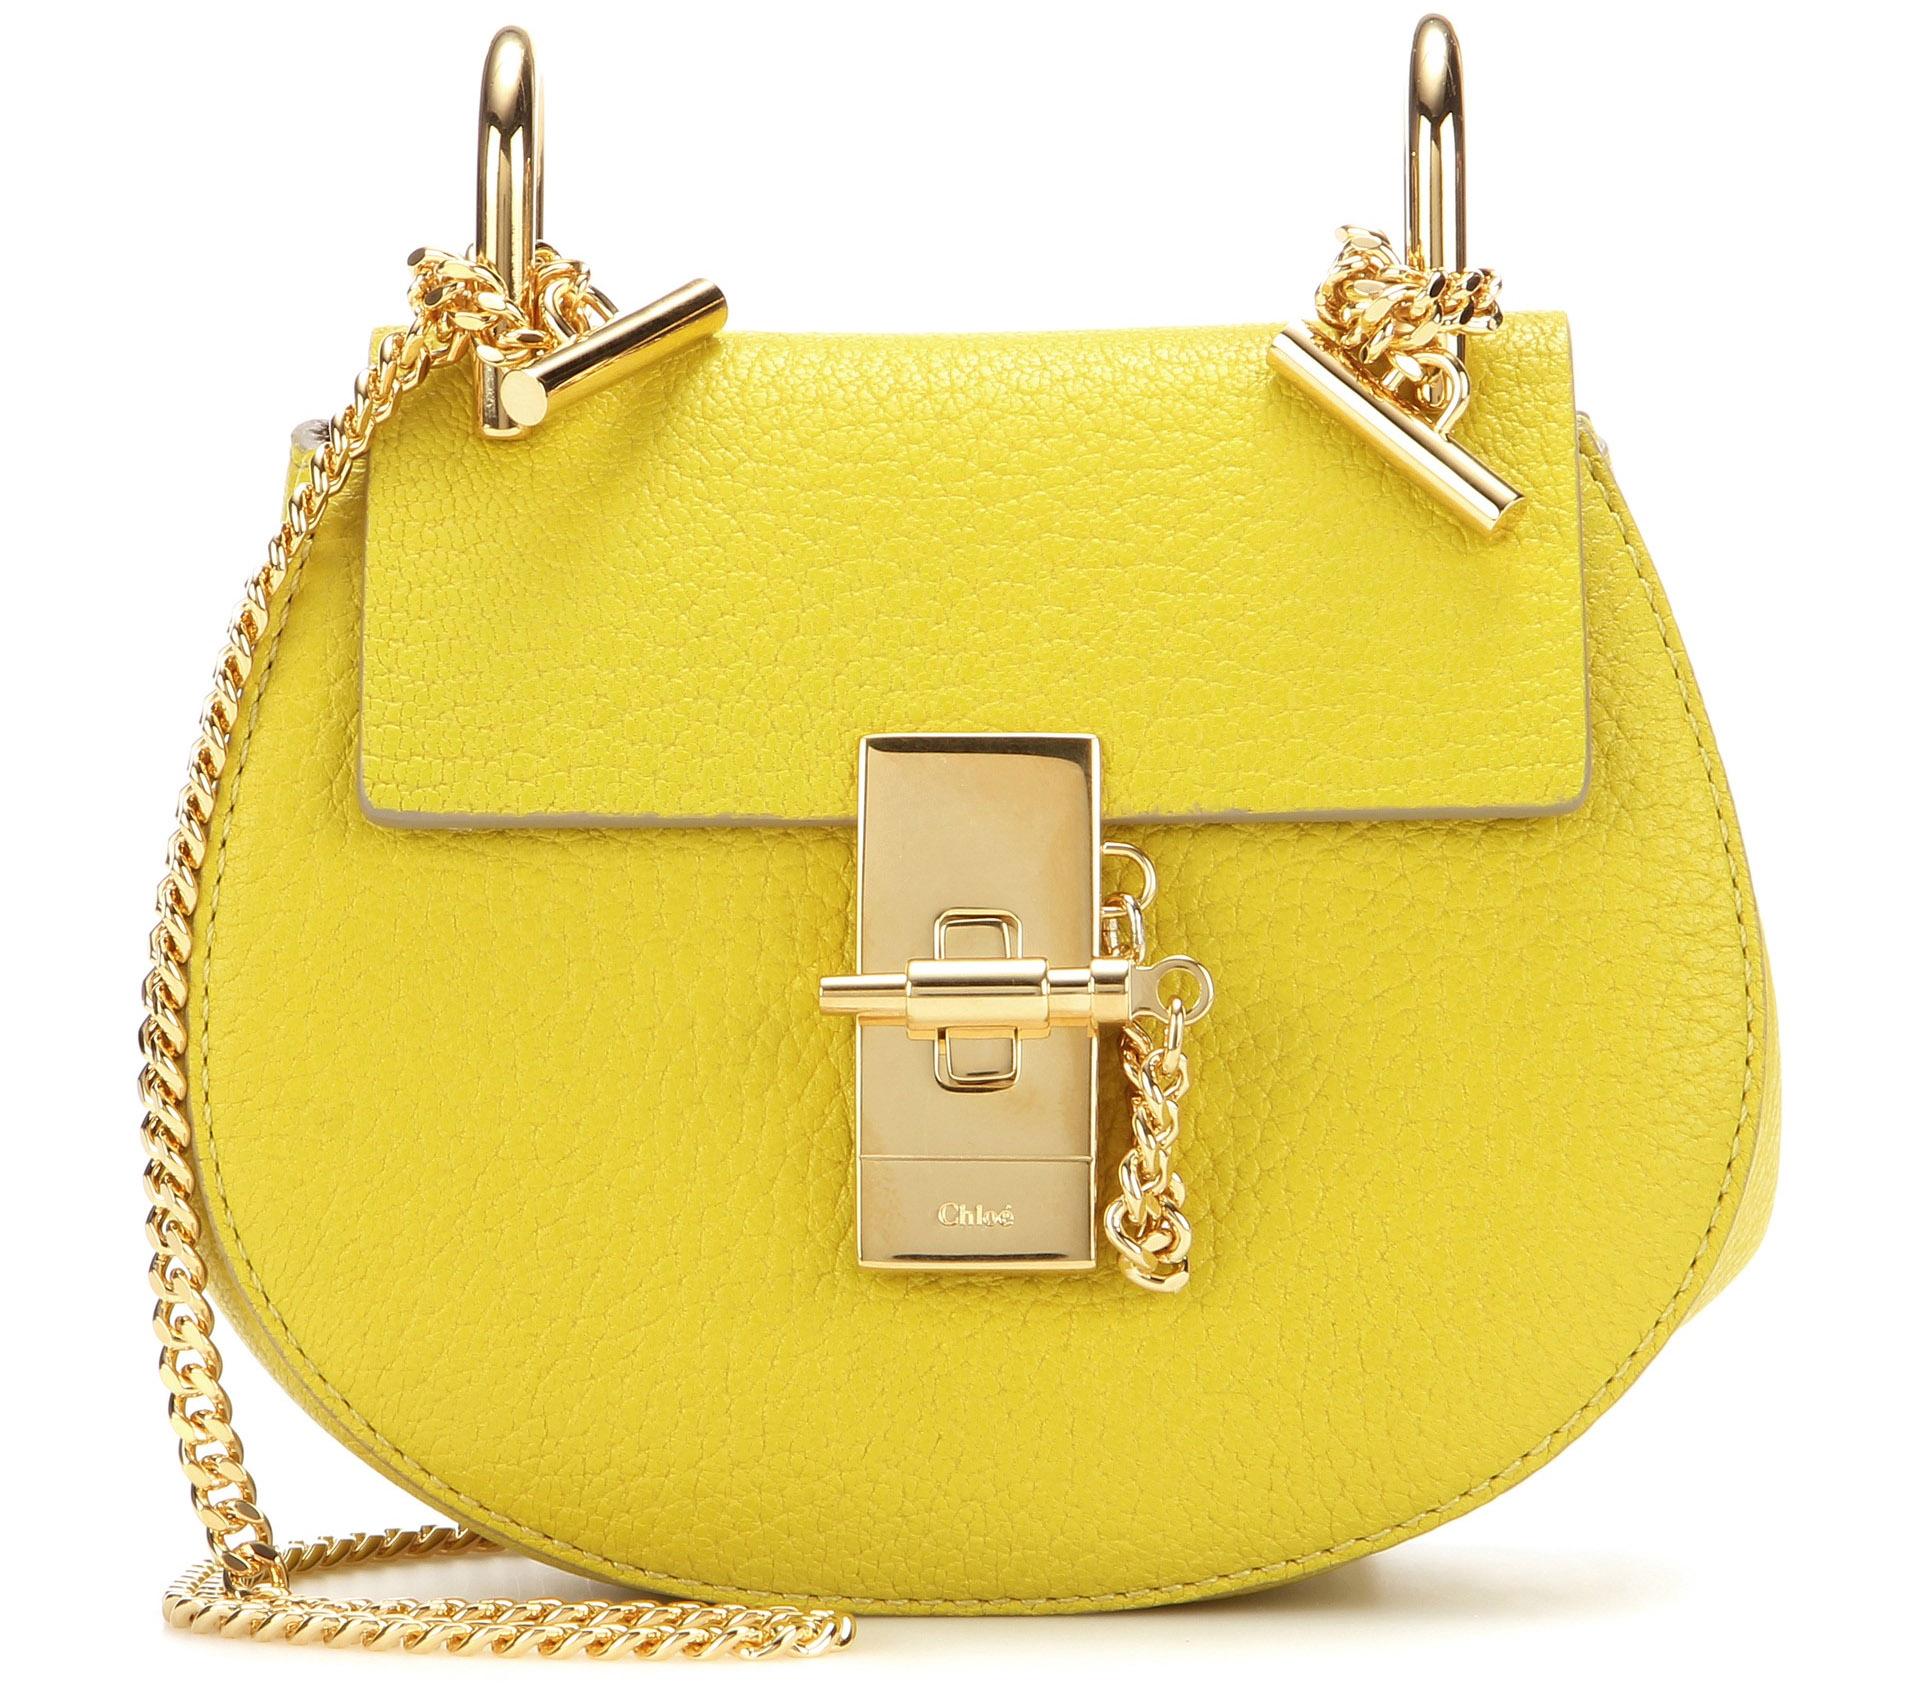 Yellow Chloe Drew bag - Yellow Chloe Nano Drew leather shoulder bag